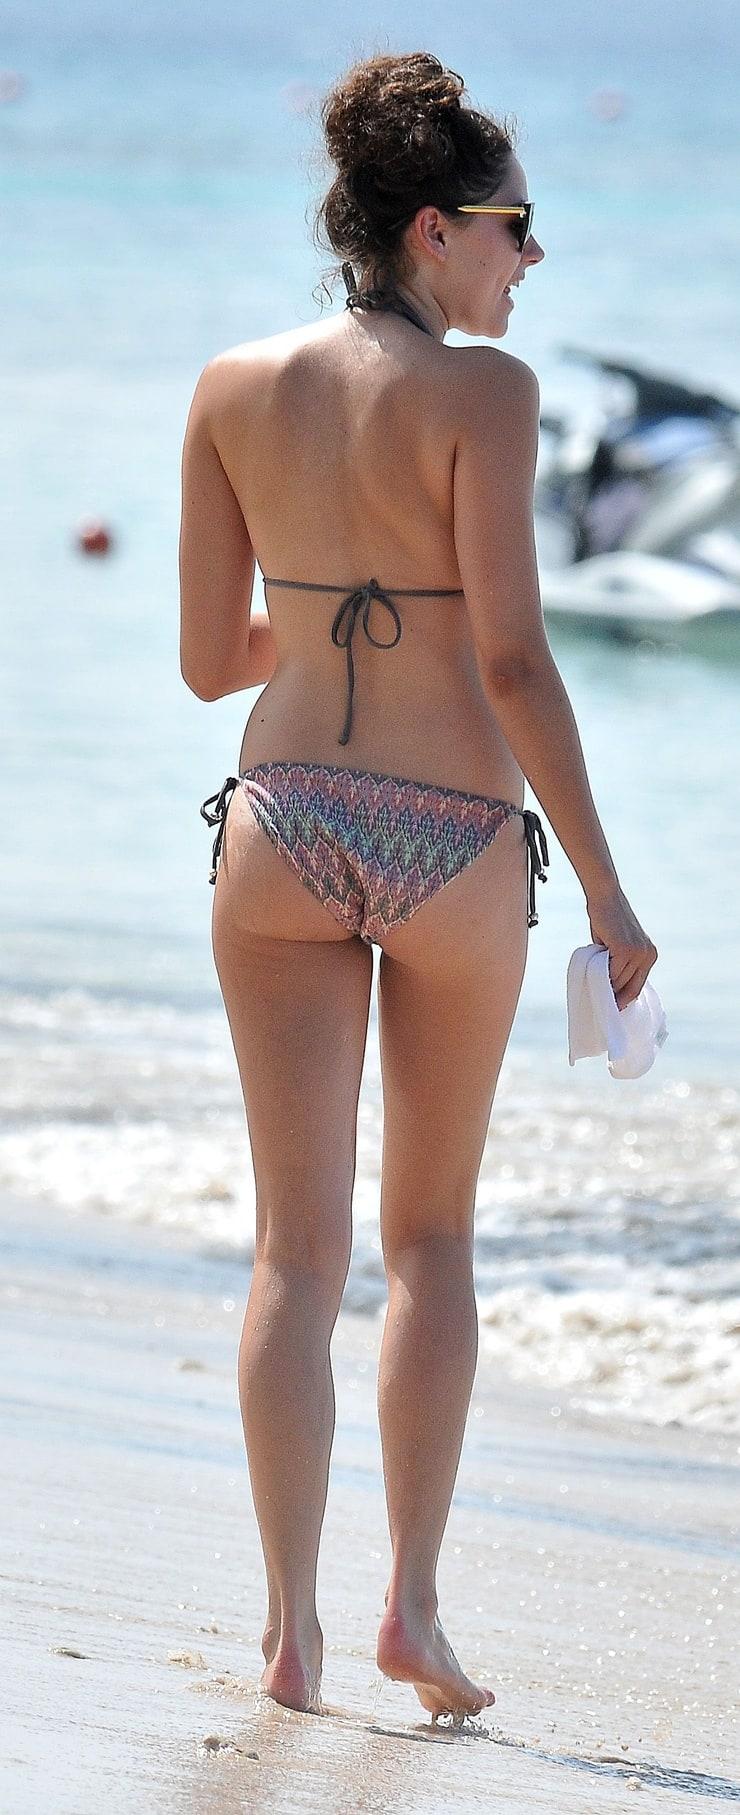 Eliza doolittle cute little panties upskirt